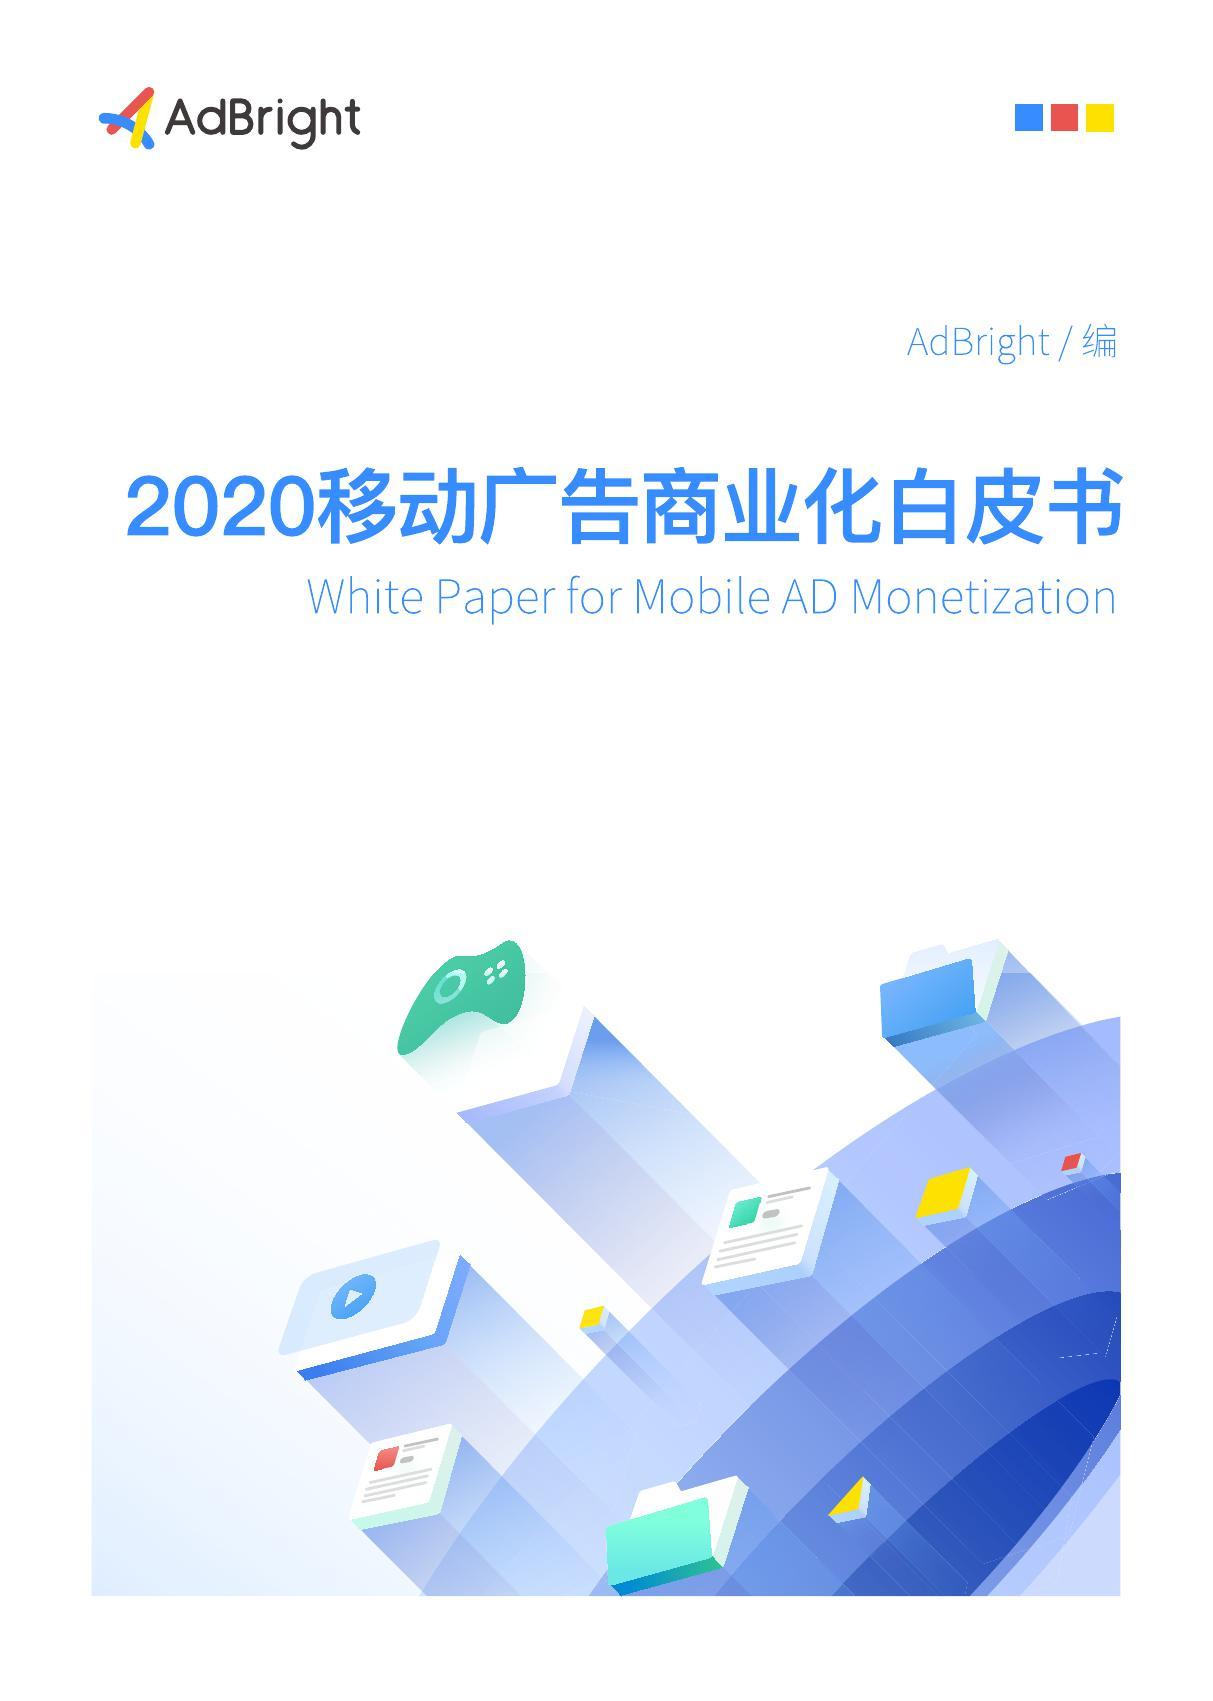 Adbright:2020移动广告商业化白皮书(附下载)